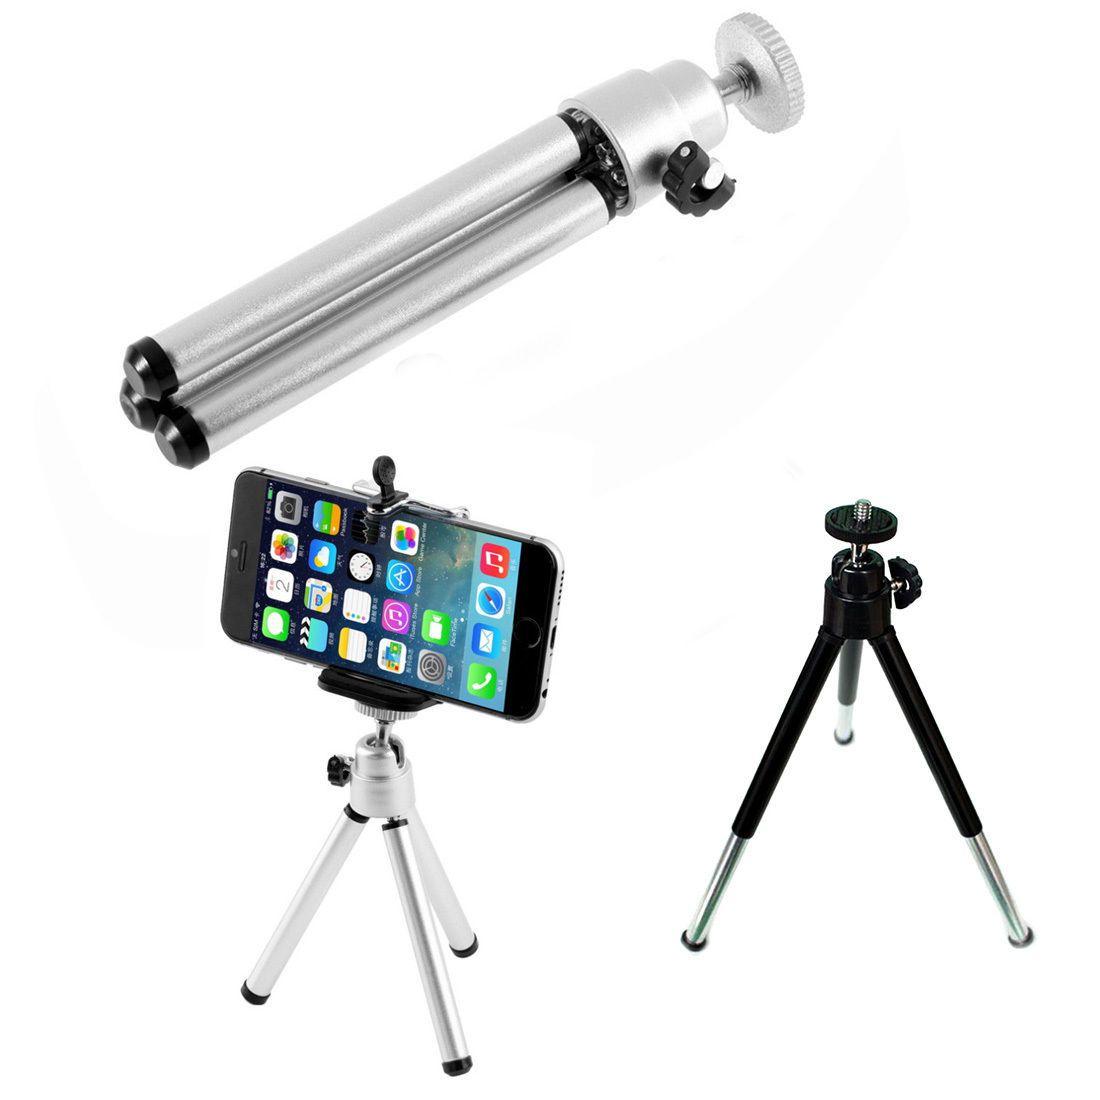 Universal Mini Stand Tripod Mount Holder For Phone Camera Blaupunkt Soundphone S2 Accesories